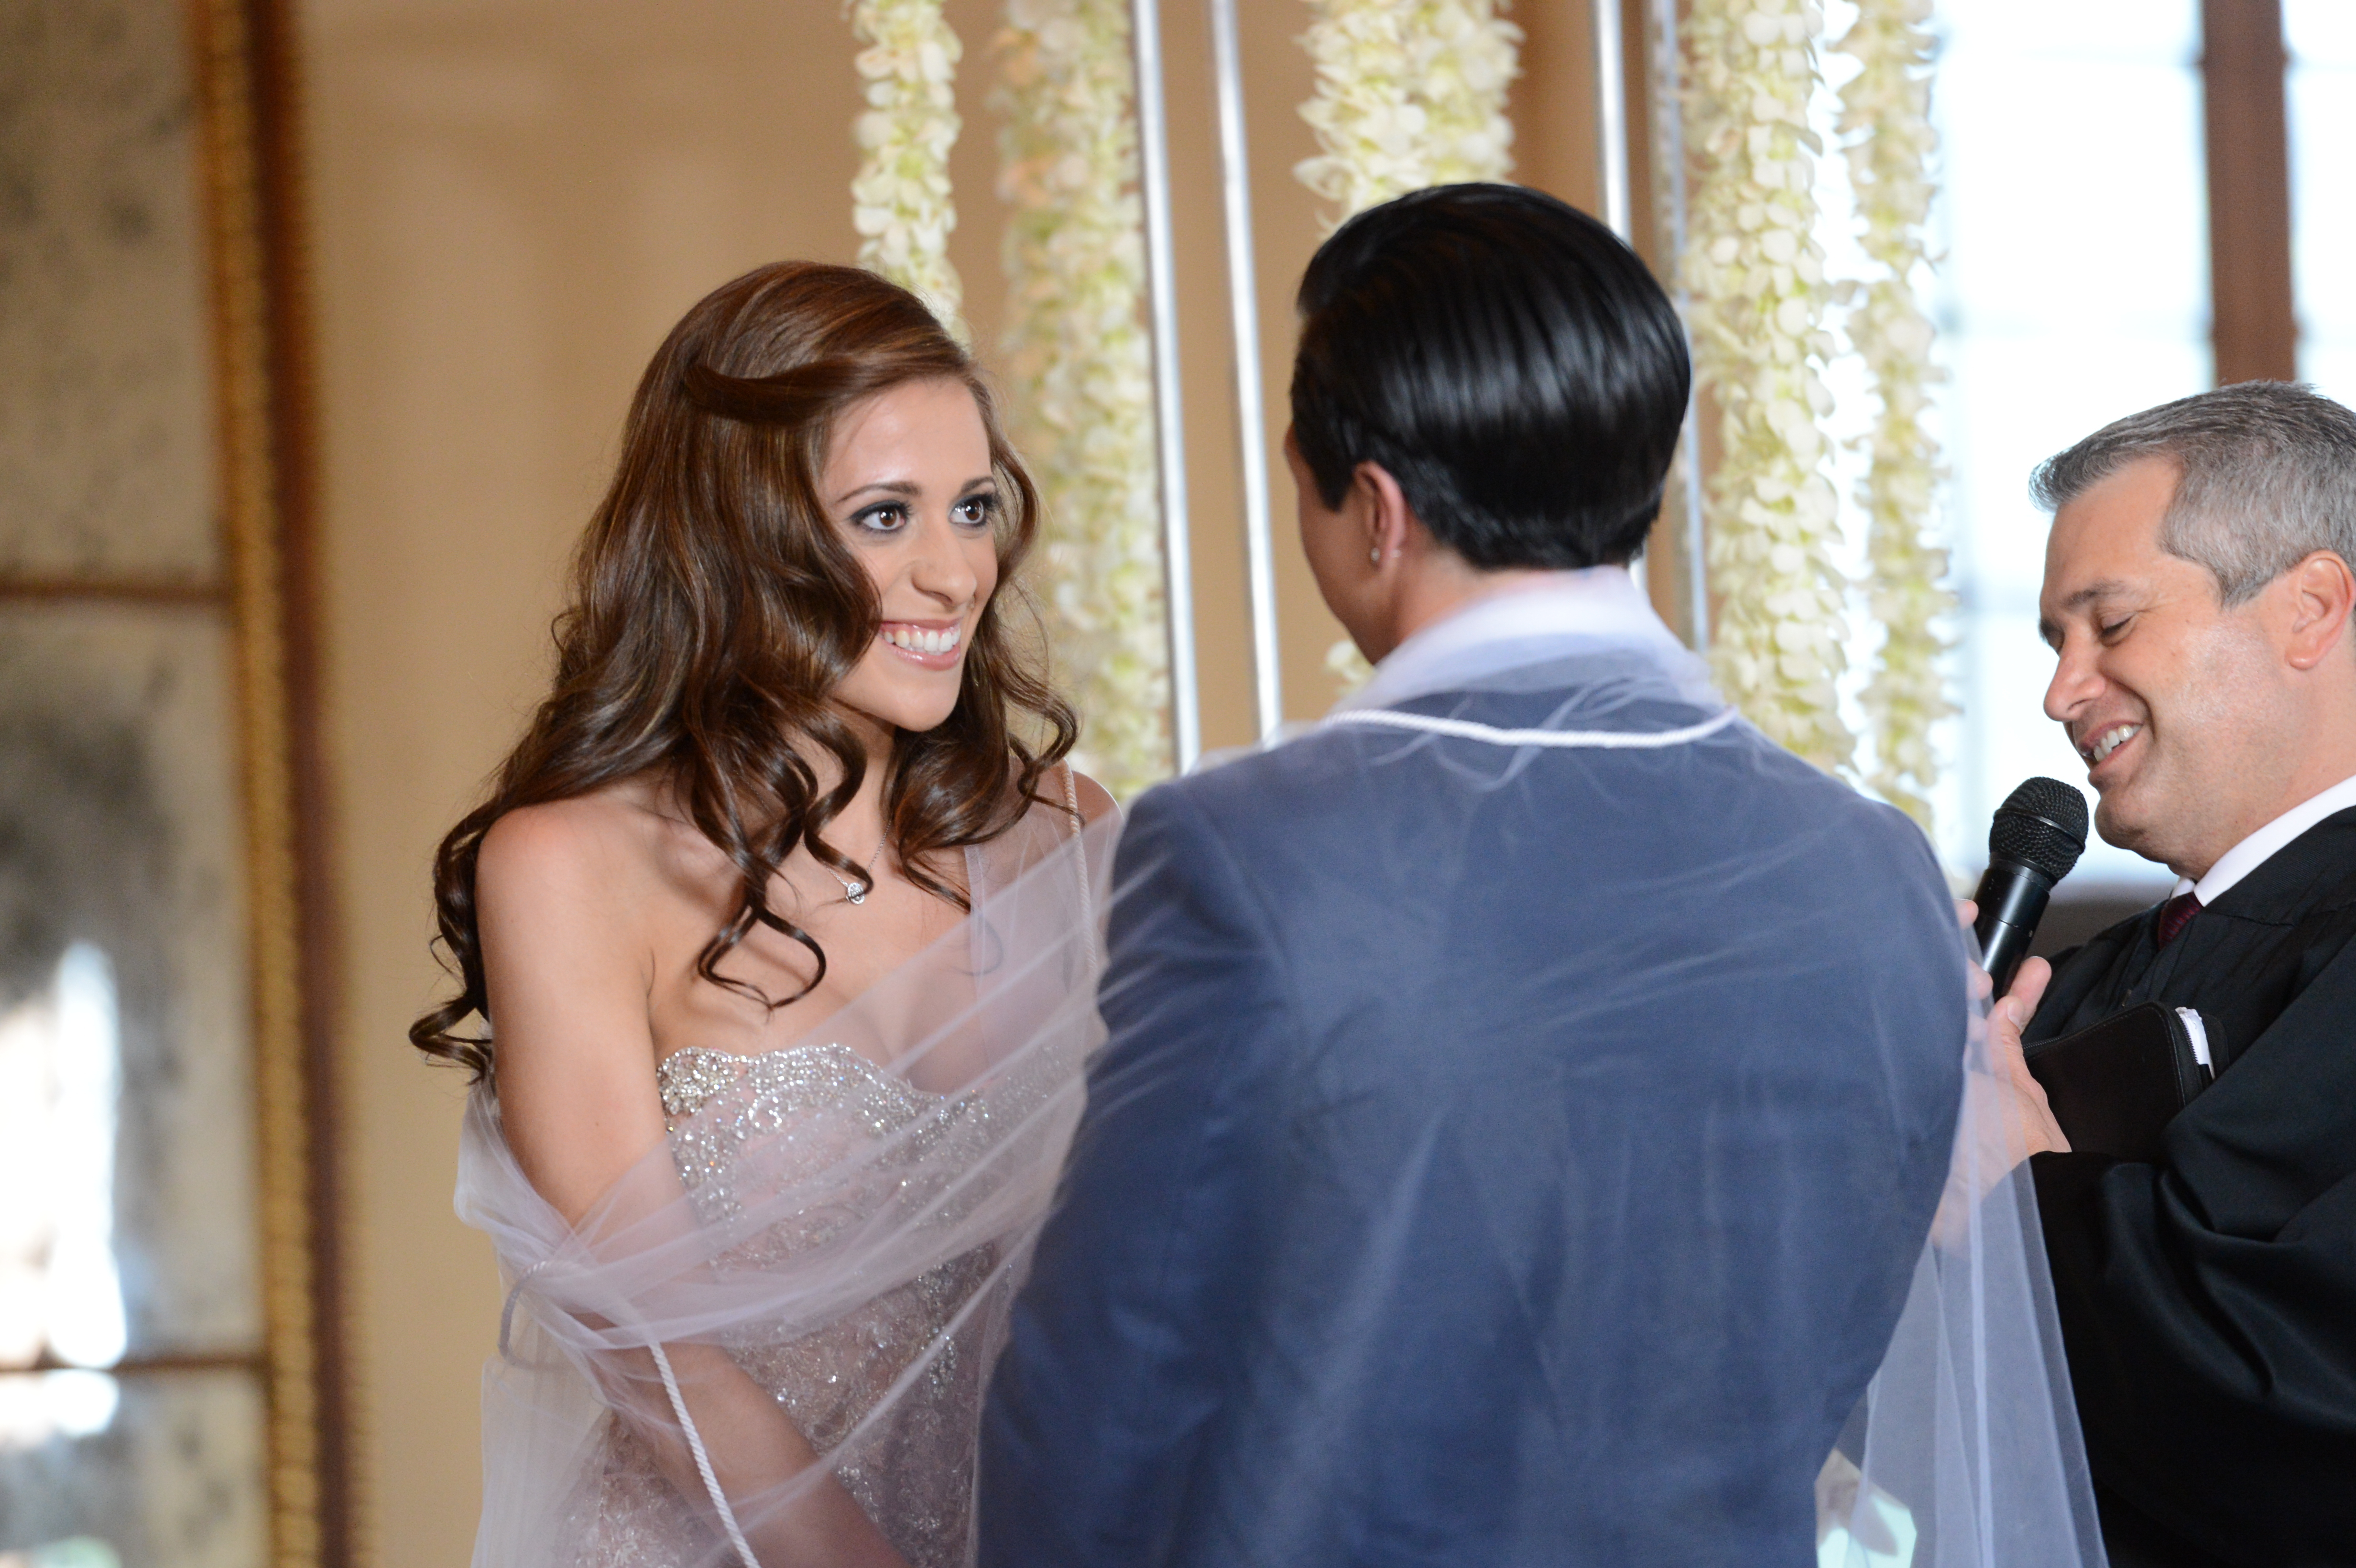 Beauty, Ceremony, Flowers & Decor, Veils, Fashion, Veil, Wedding, Vows, Hair, Curls, Persephone eddie